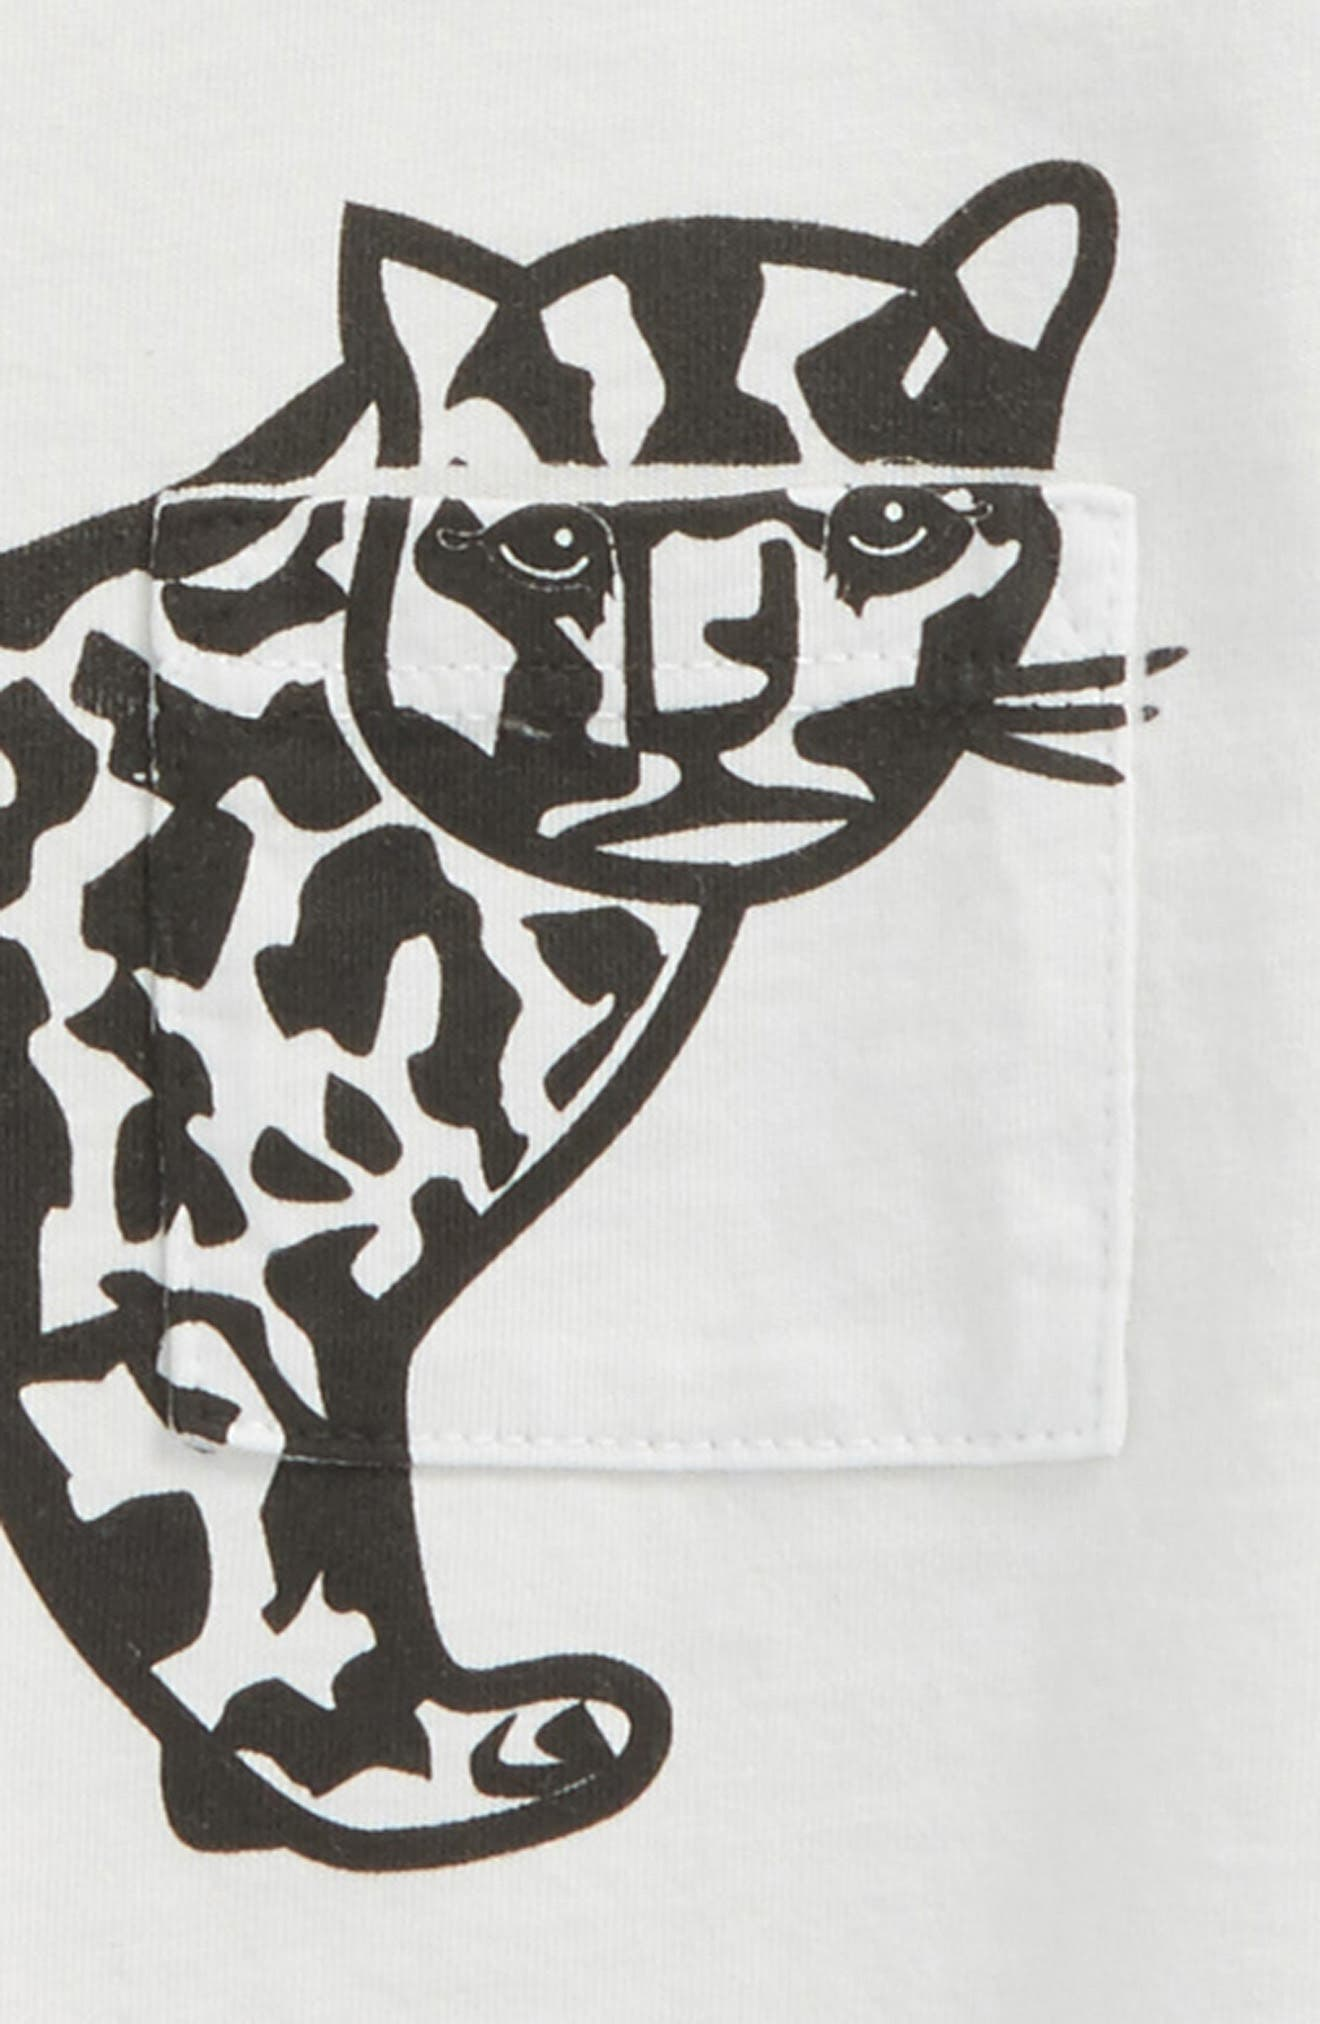 Huxley Leopard Graphic Organic Cotton T-Shirt,                             Alternate thumbnail 2, color,                             100